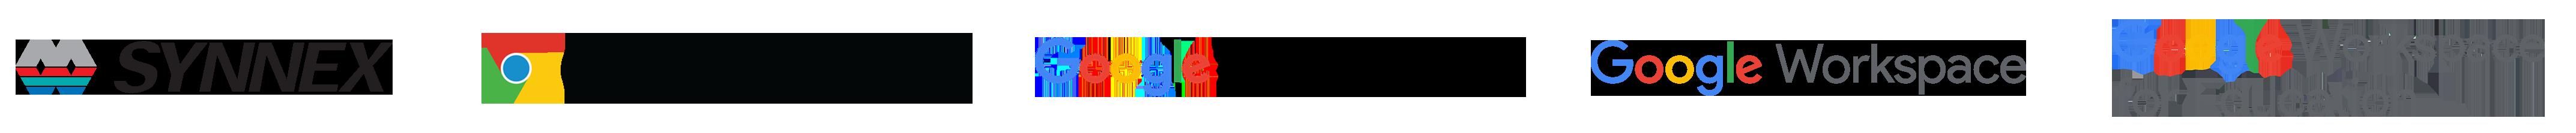 Synnex Australia | Google Chrome Logo